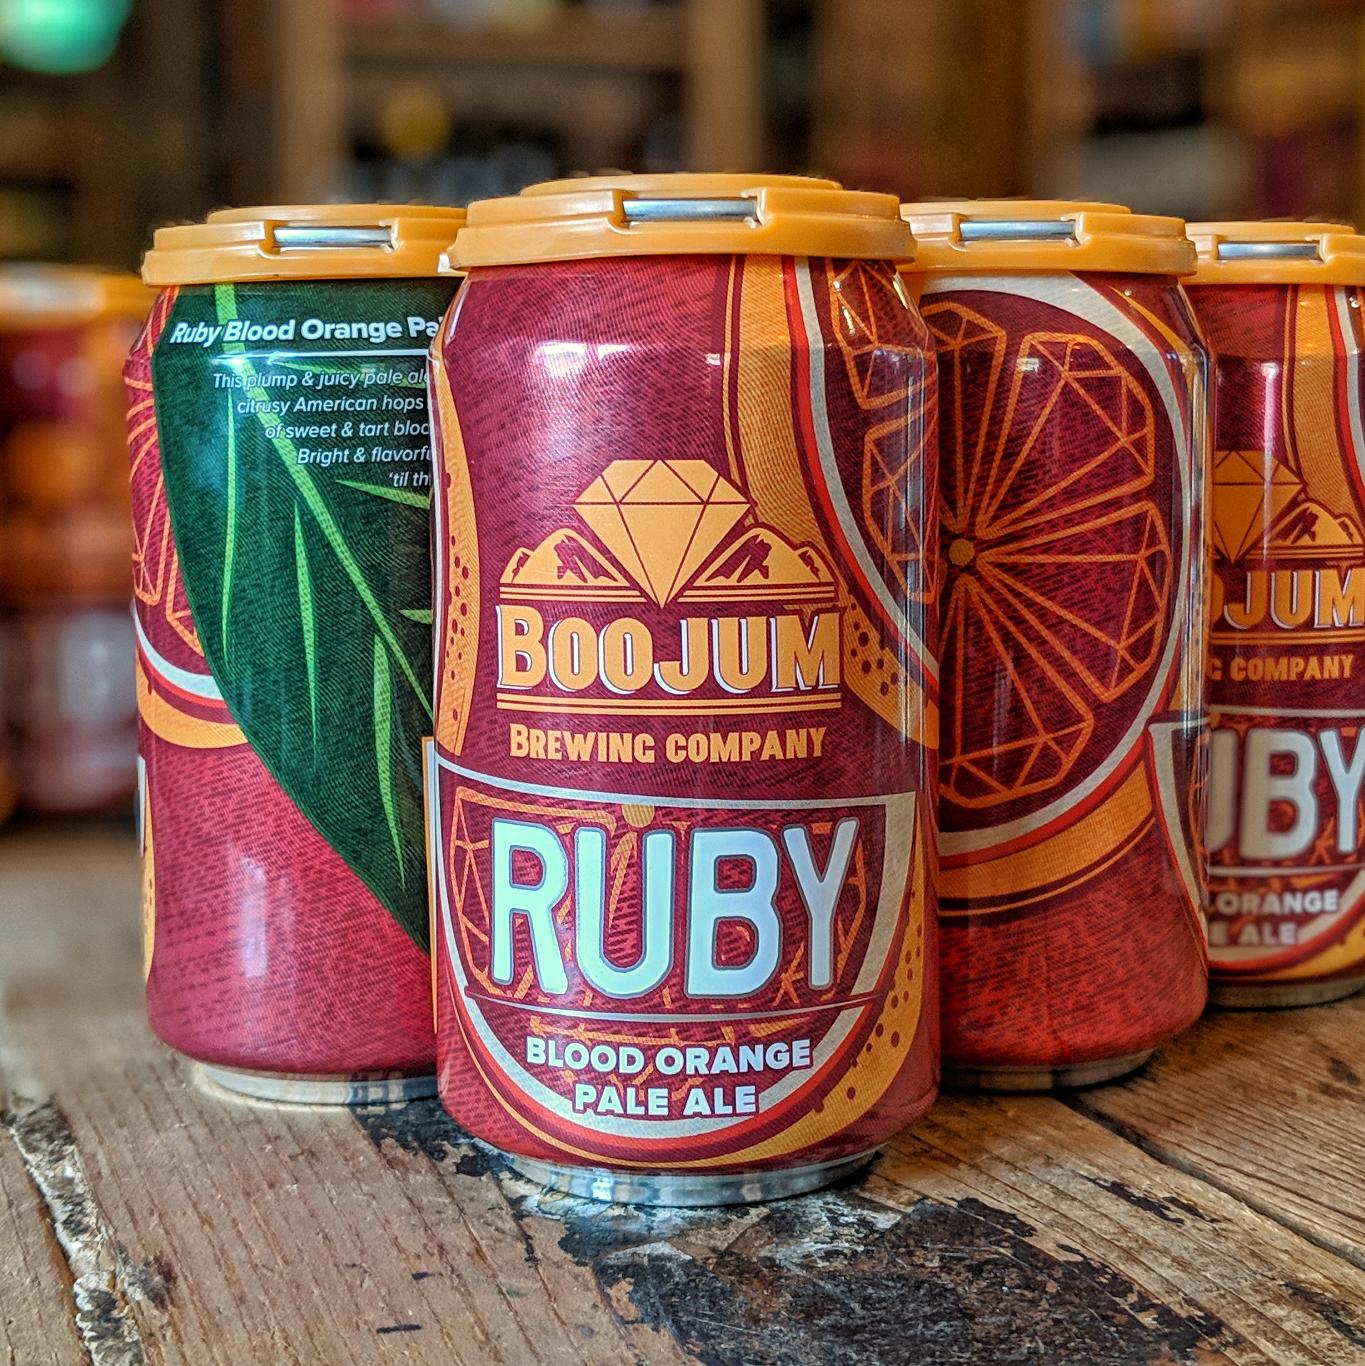 Boojum Brewing Co. 'Ruby Blood Orange Pale' 12oz Can